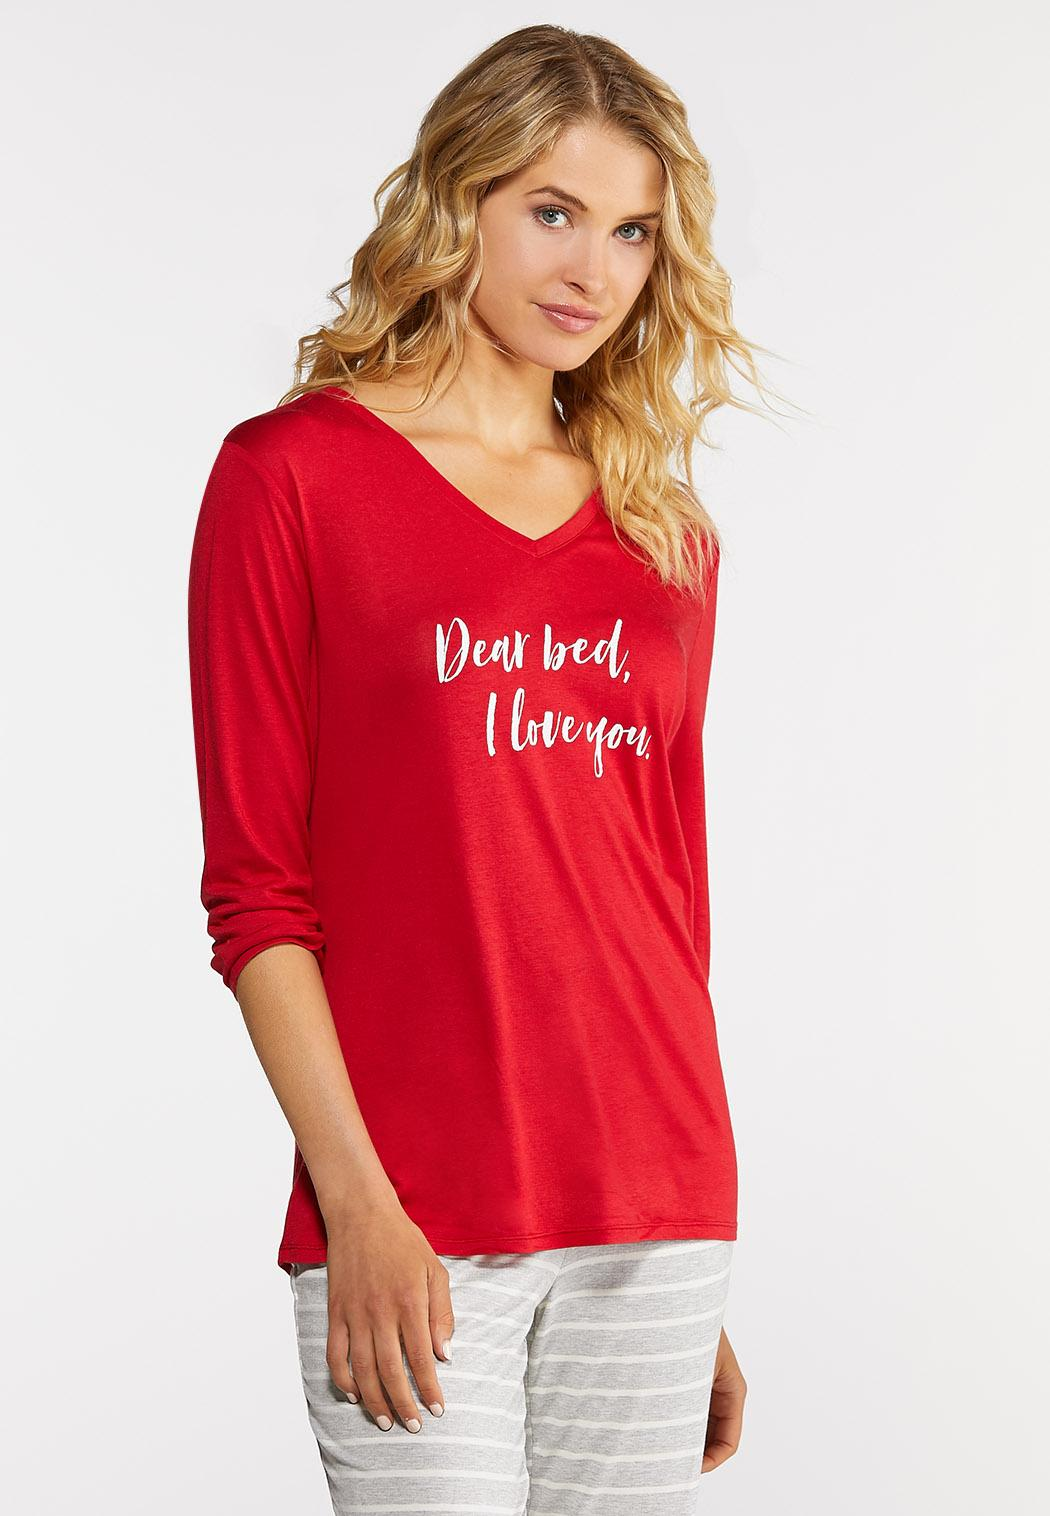 Dear Bed Sleep Shirt